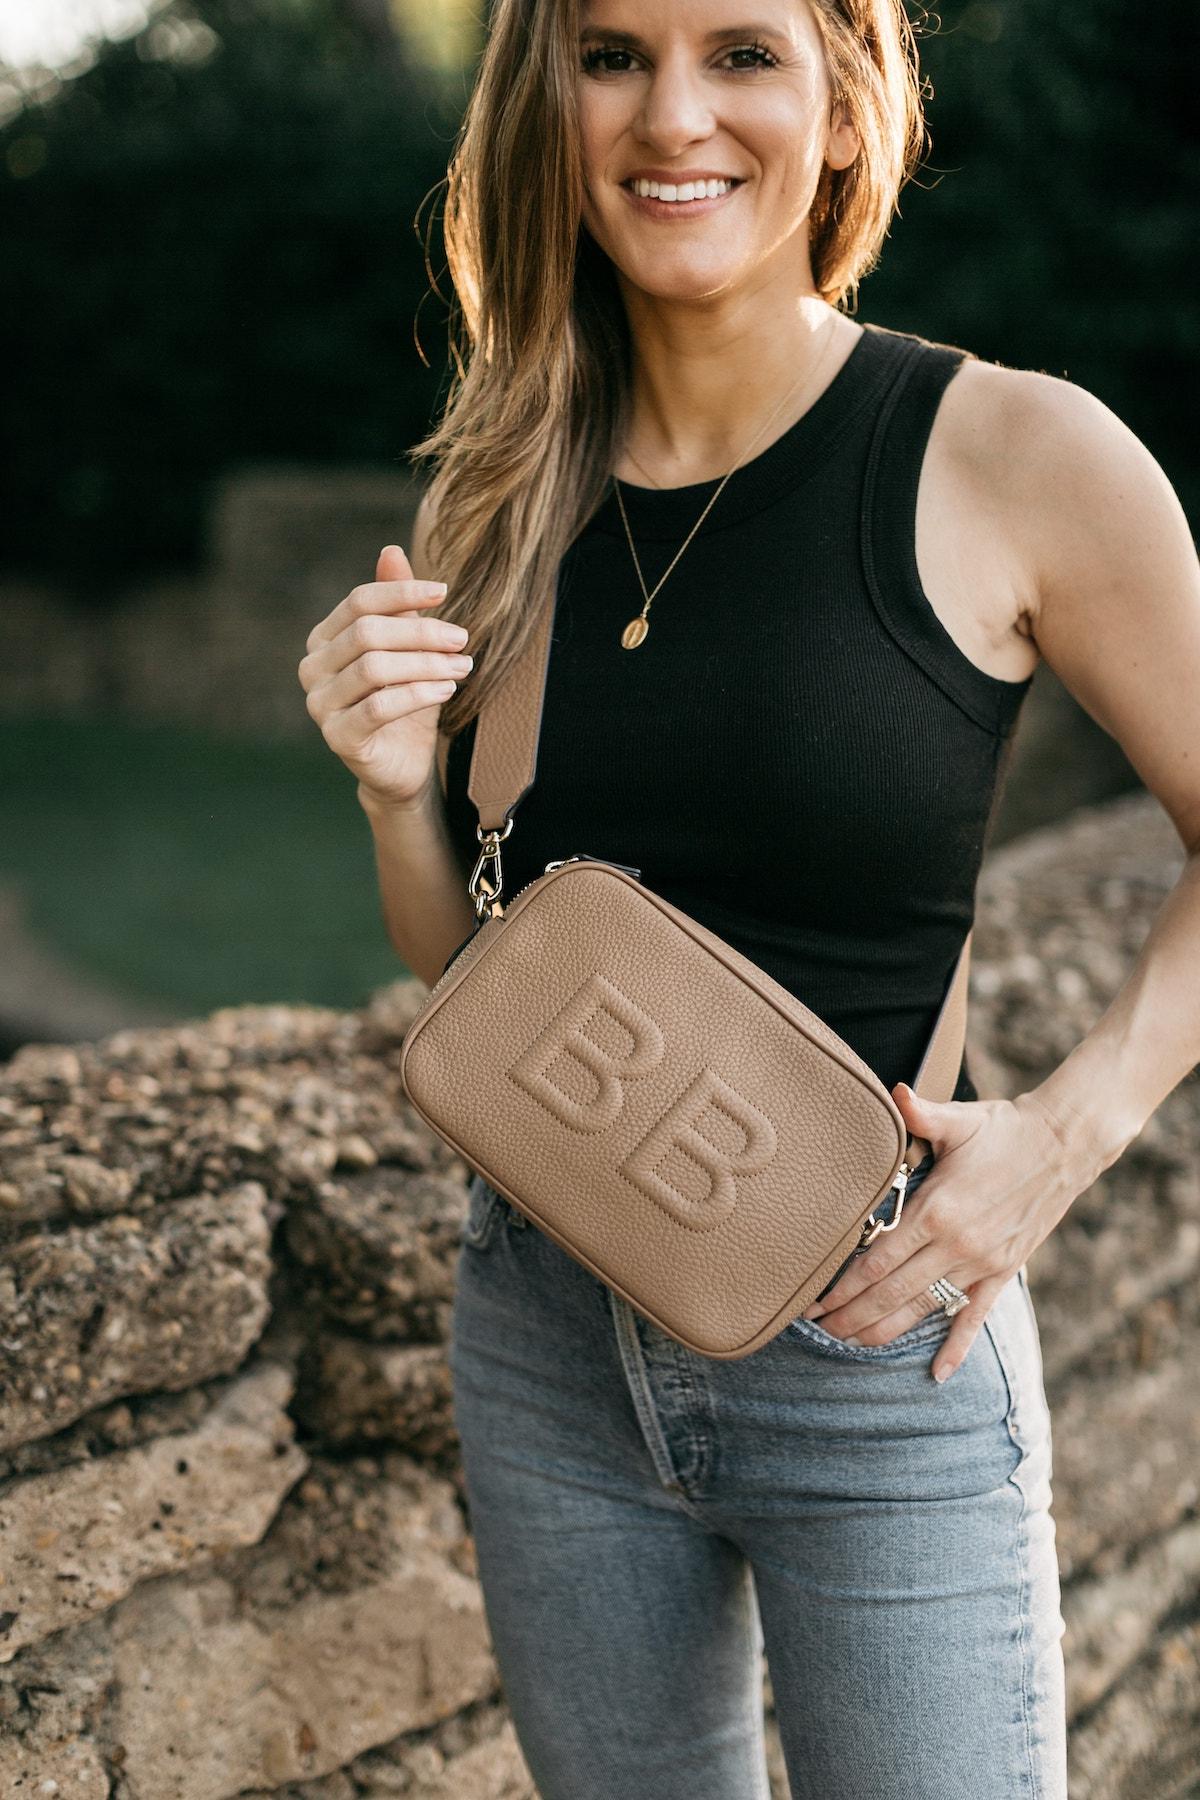 2021 - brighton butler leatherology crossbody bag personalized 3